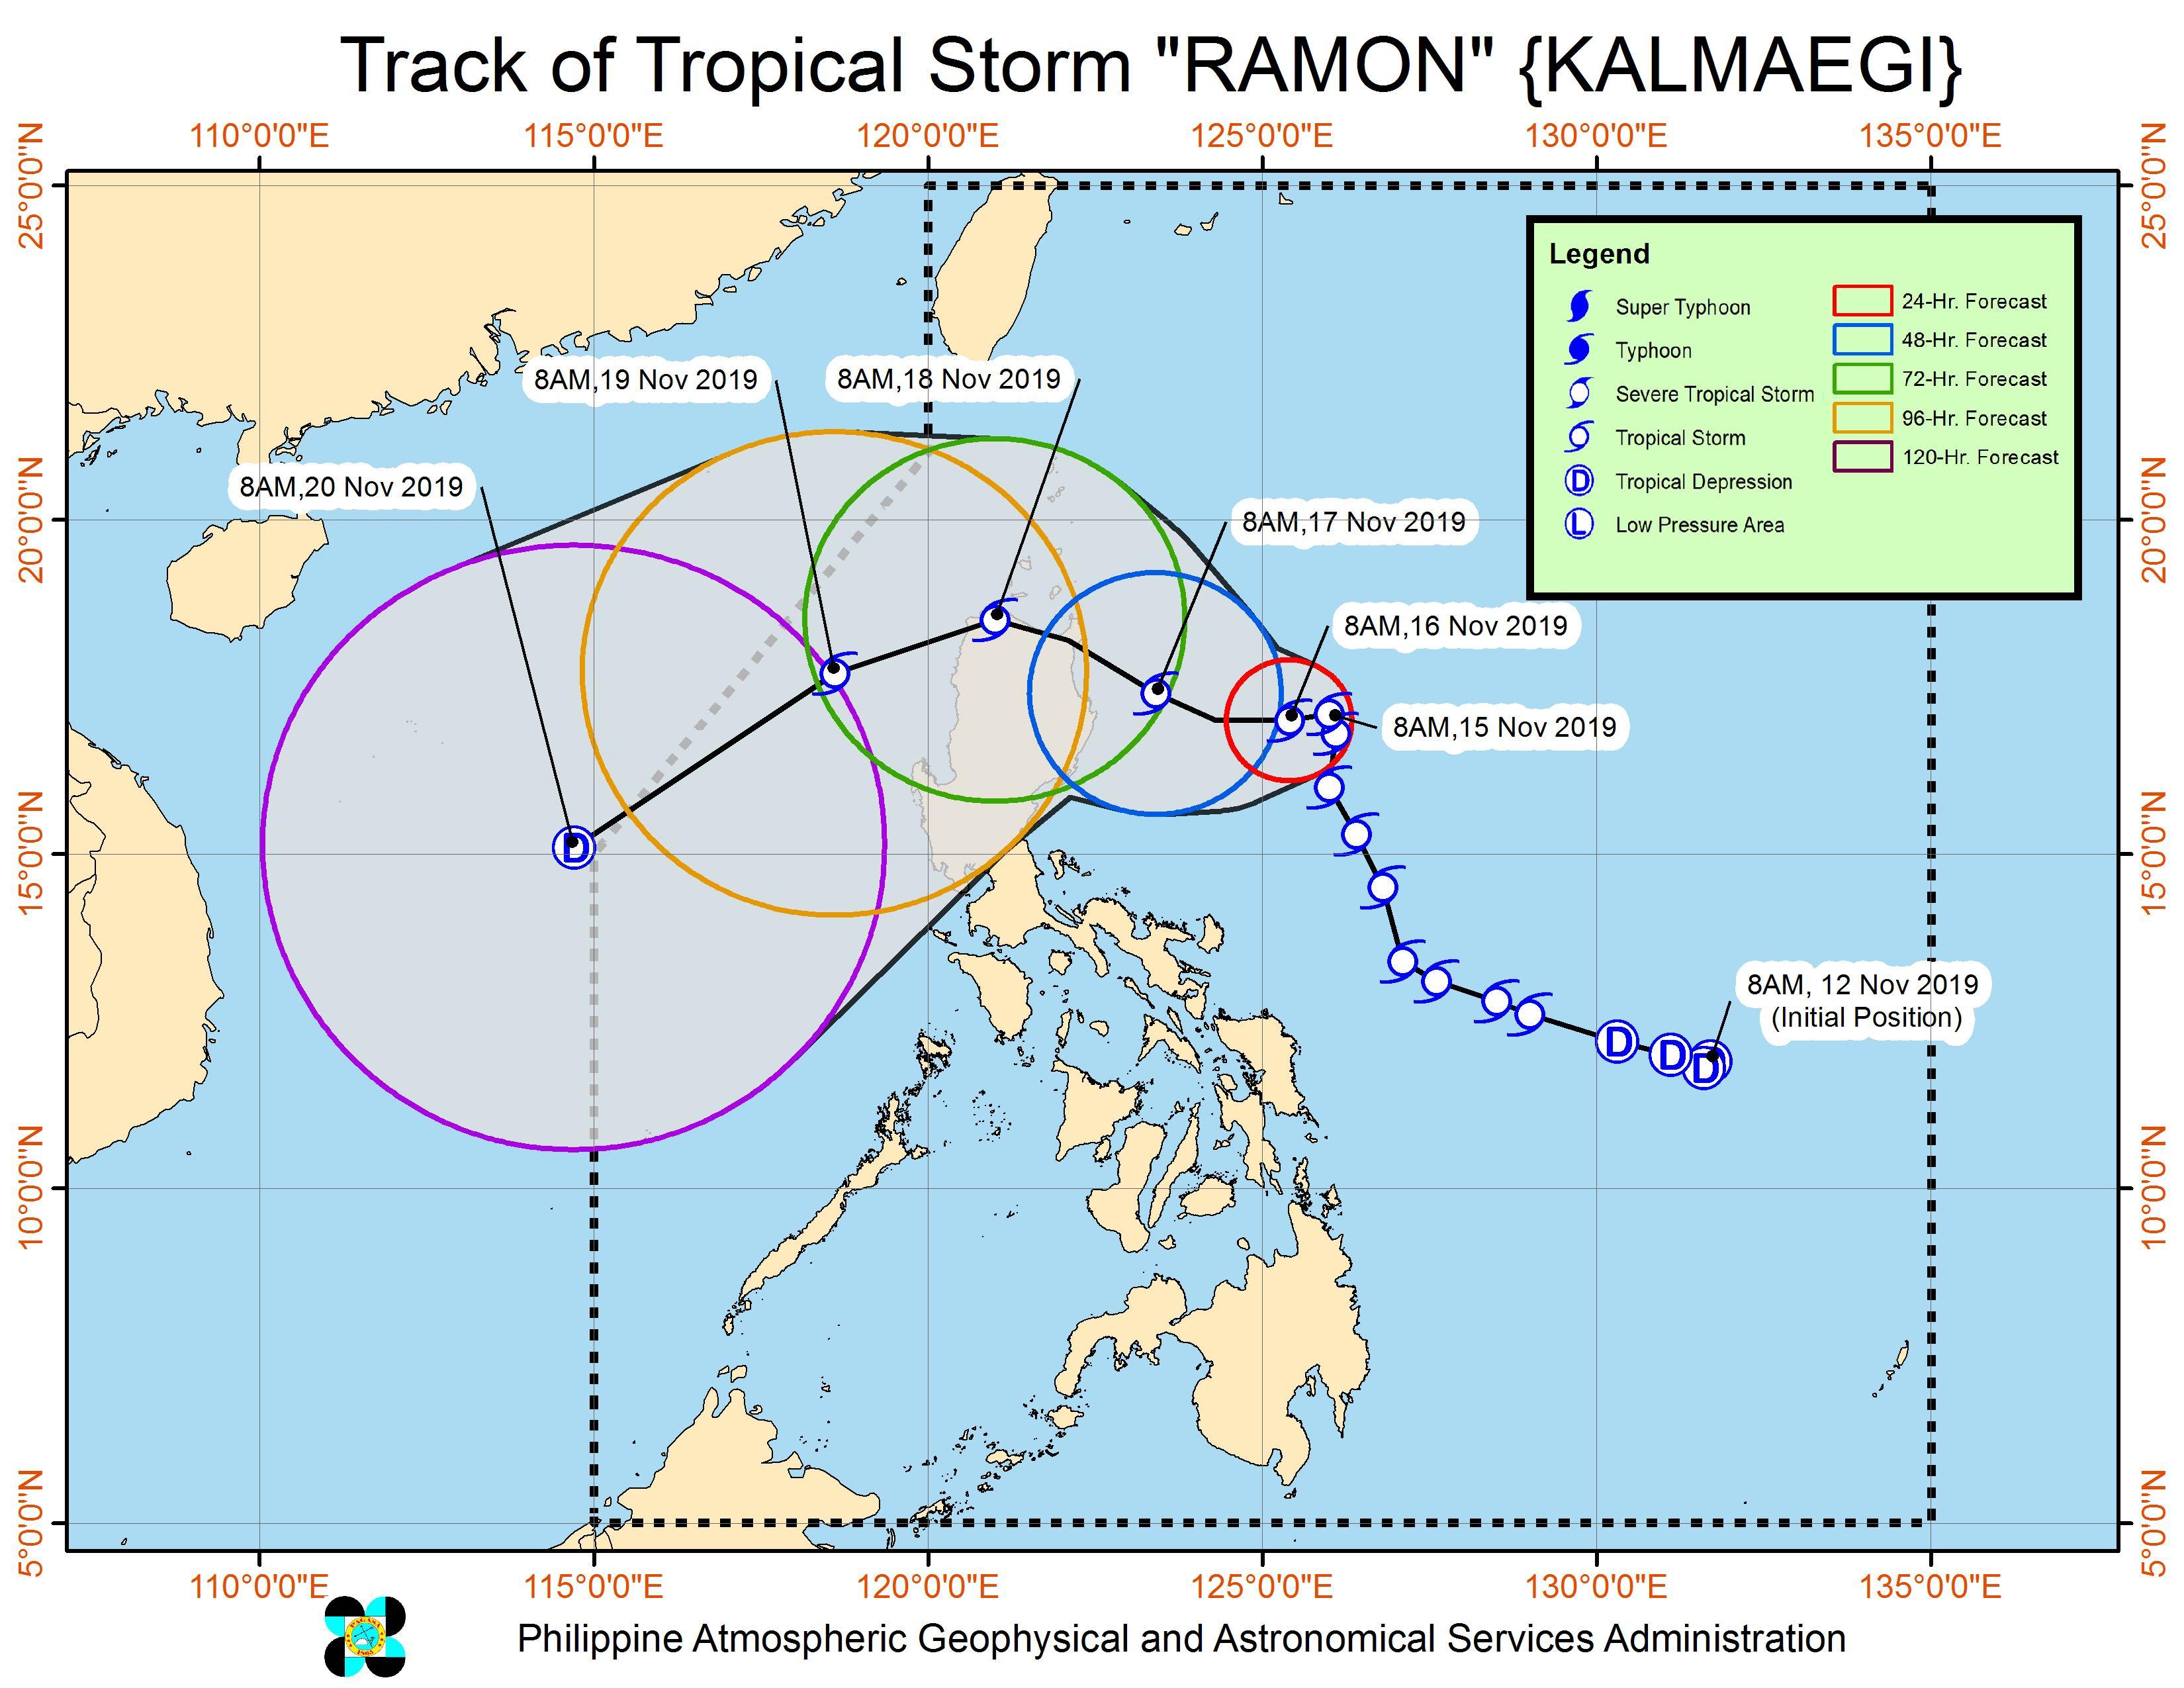 Forecast track of Tropical Storm Ramon (Kalmaegi) as of November 15, 2019, 11 am. Image from PAGASA